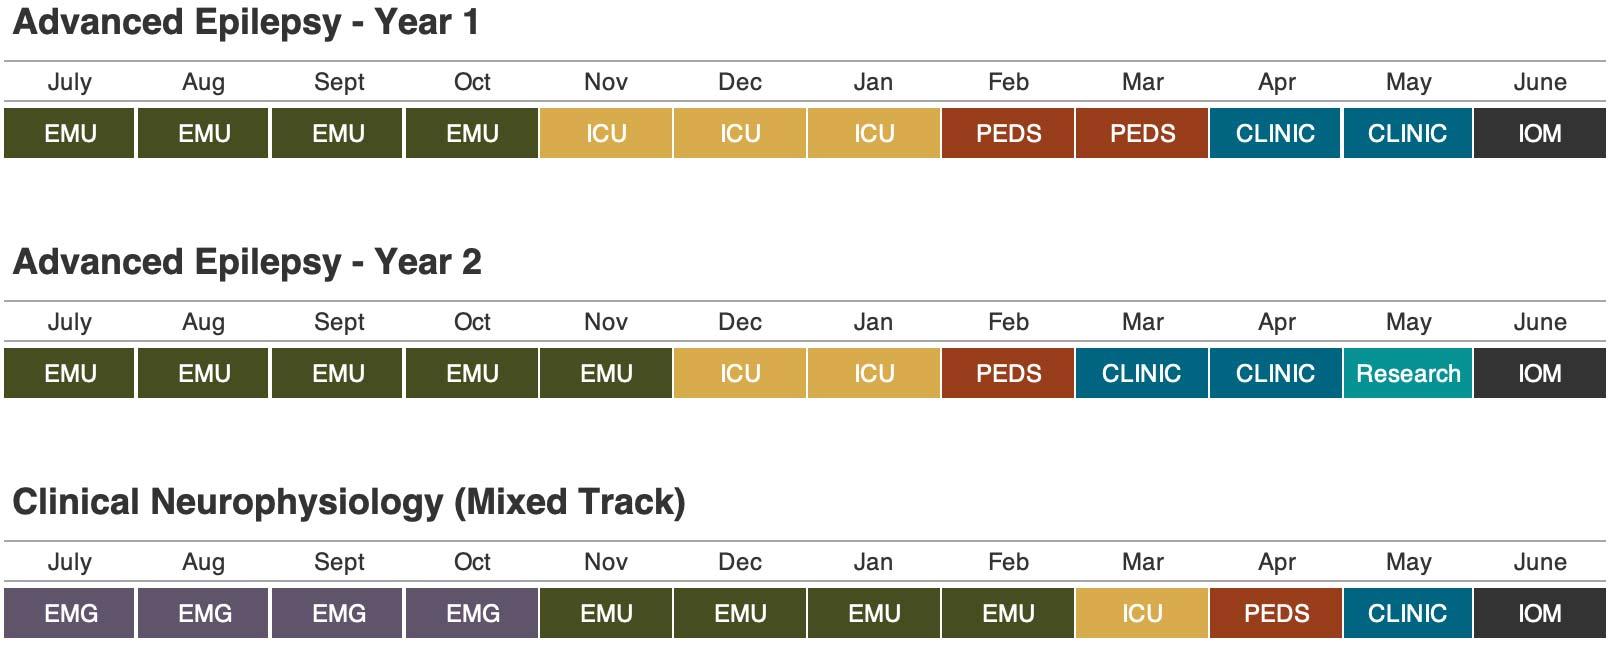 Clinical Neurophysiology Sample Schedule